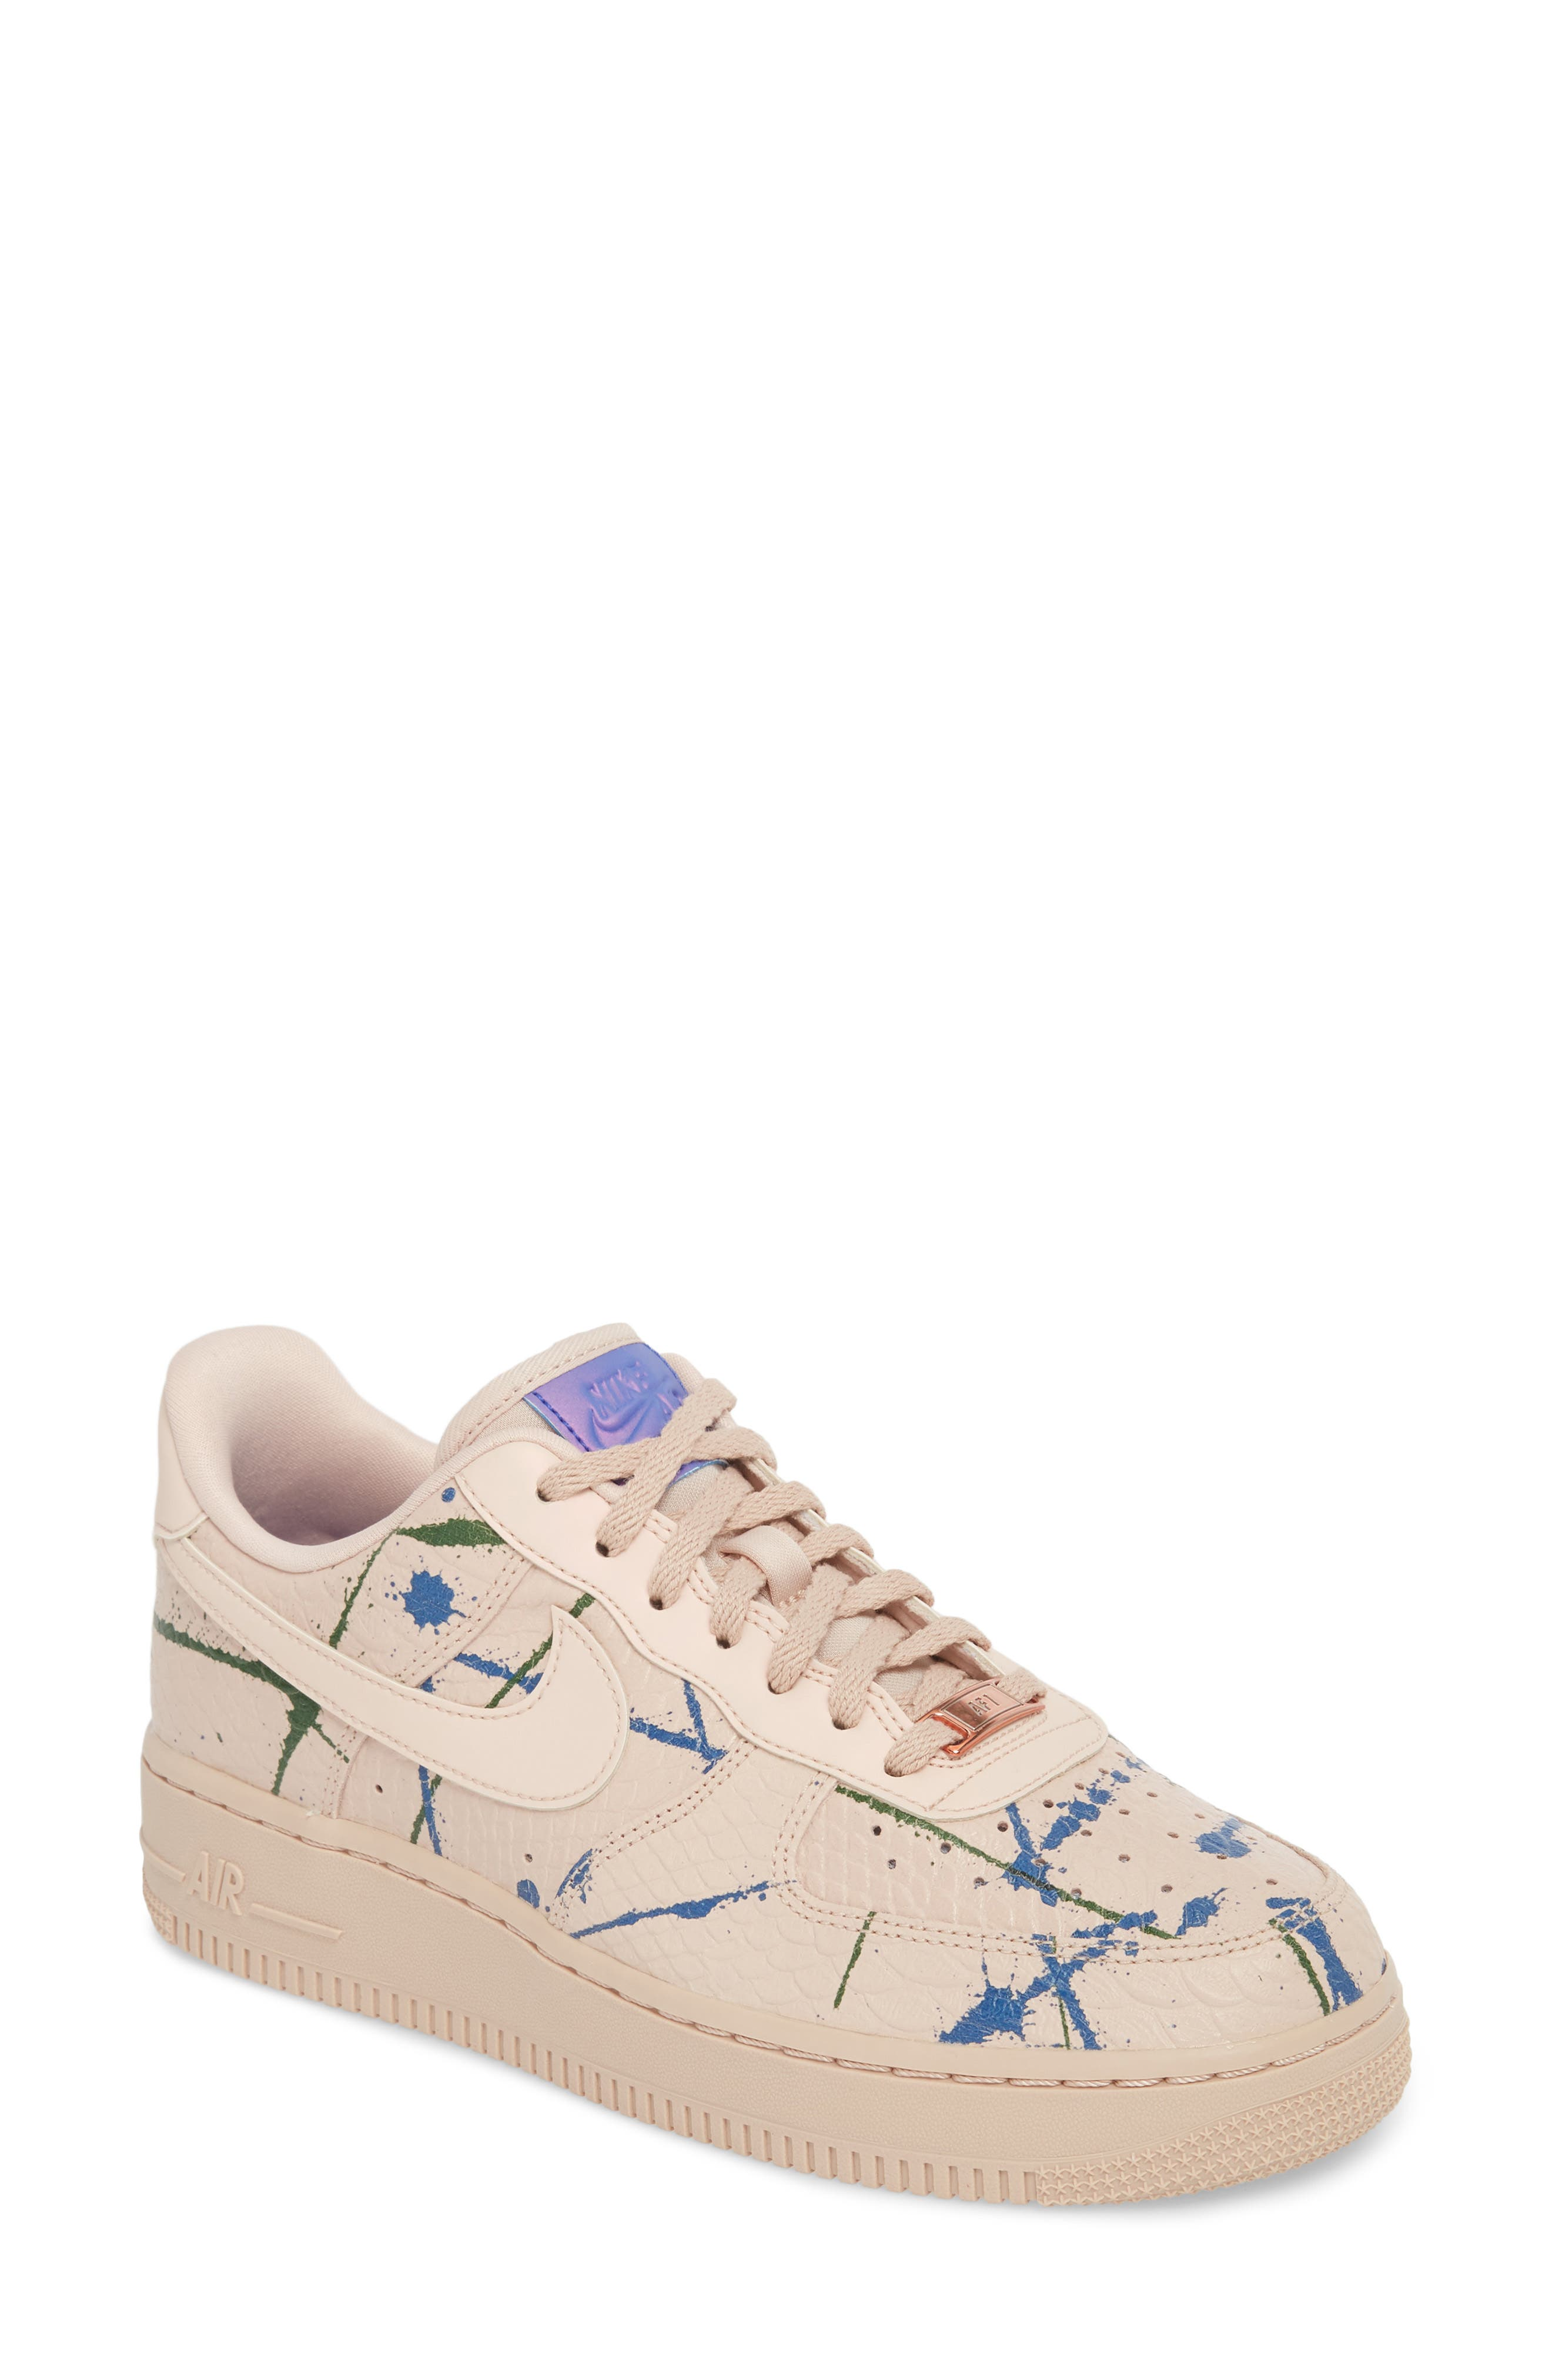 nike air force 1 07 lx sneaker women